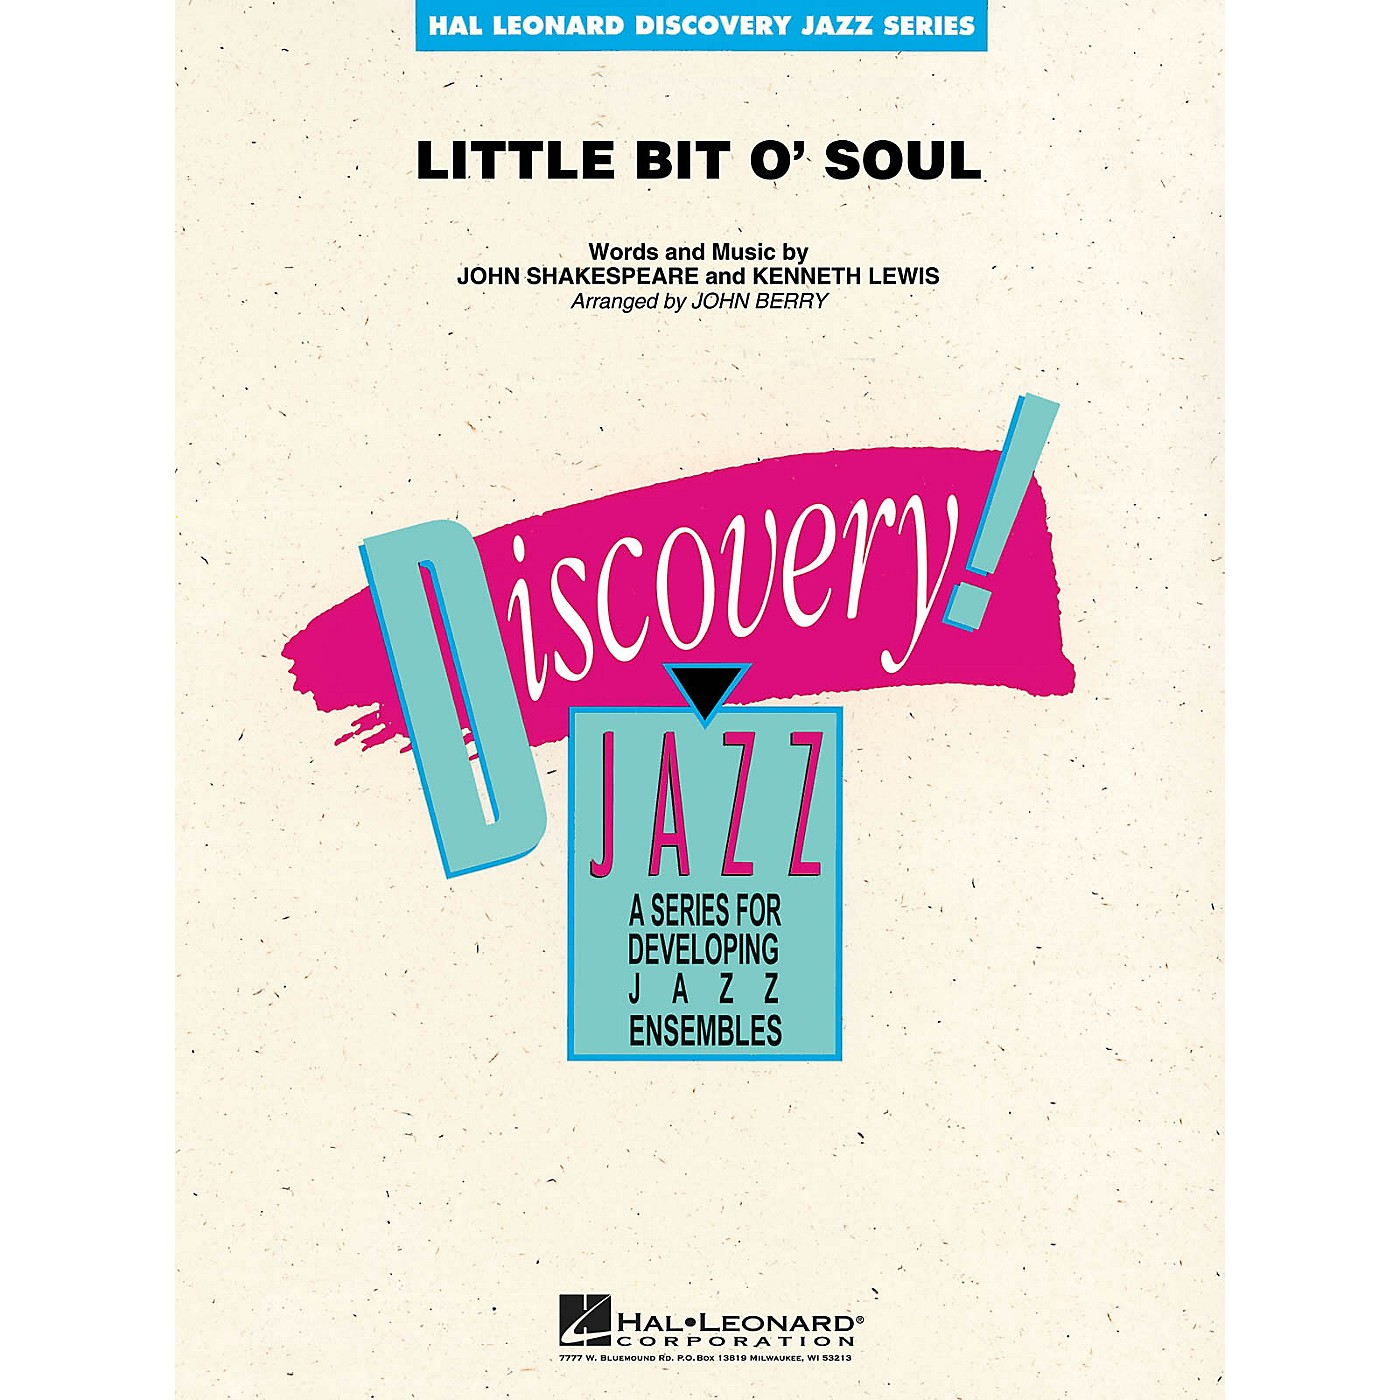 Hal Leonard Little Bit O' Soul Jazz Band Level 1-2 Arranged by John Berry thumbnail